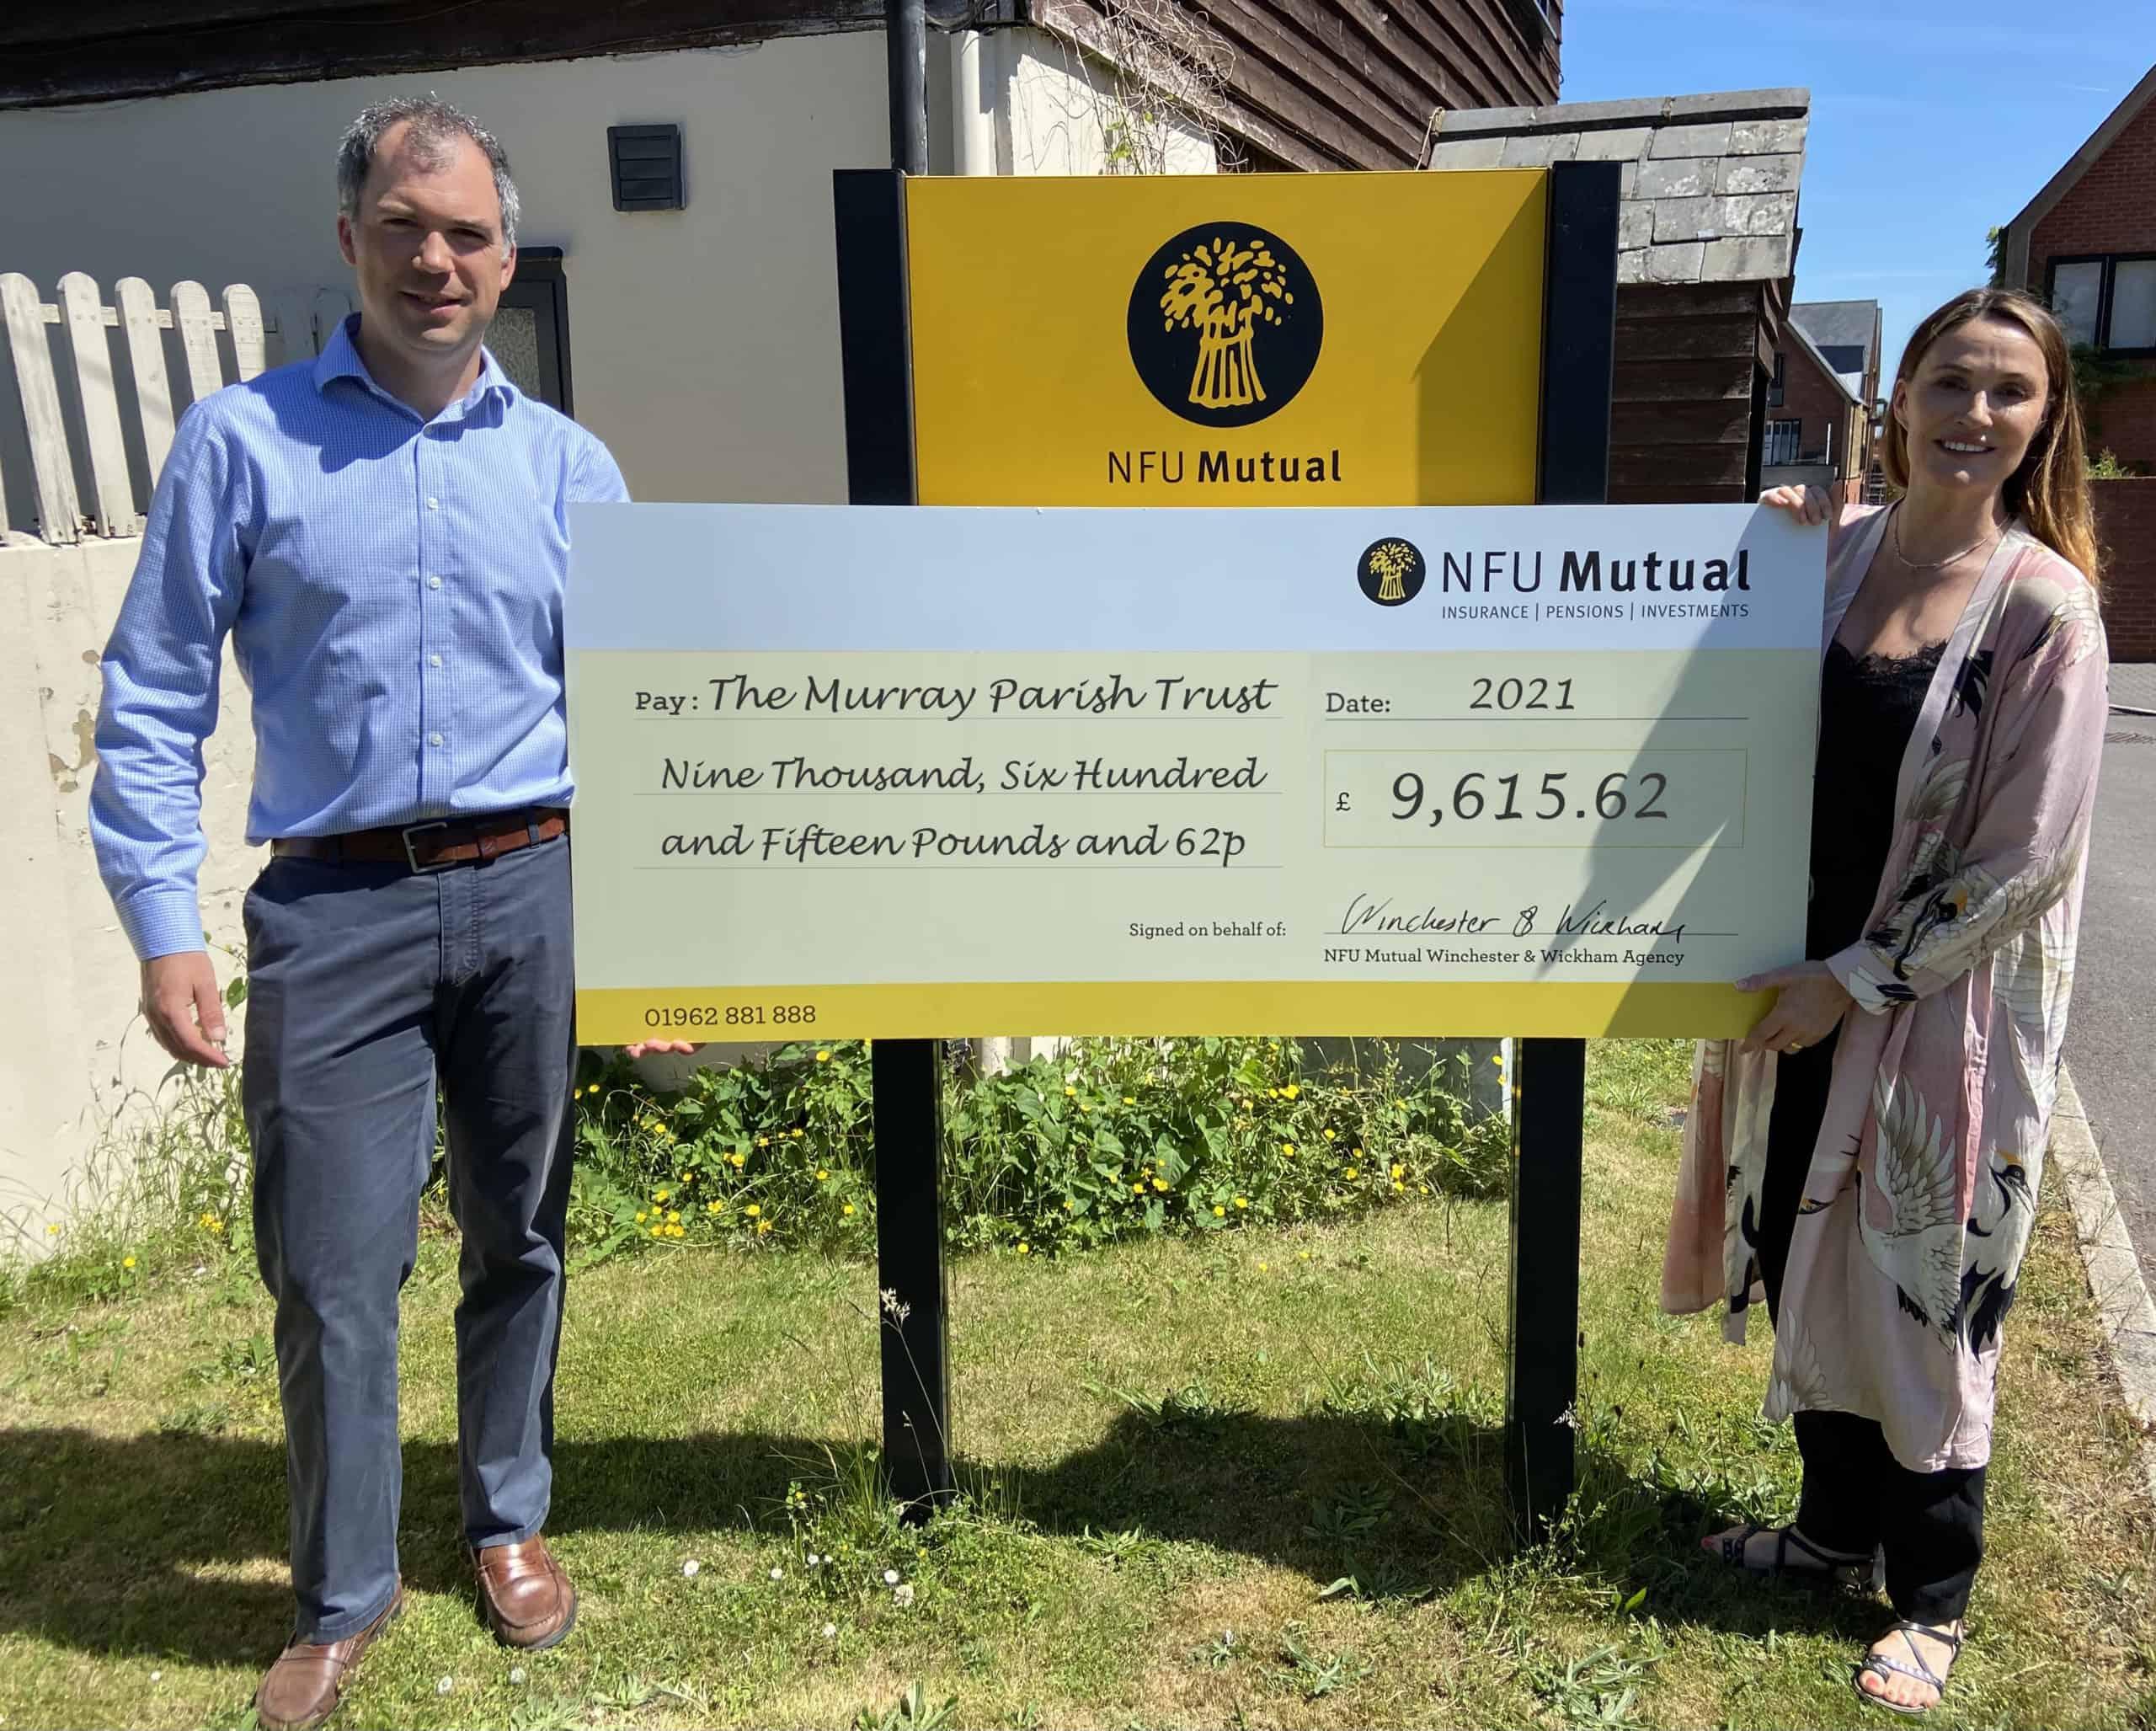 Sarah Parish and James Prewett NFU Mutual donation to The Murray Parish Trust